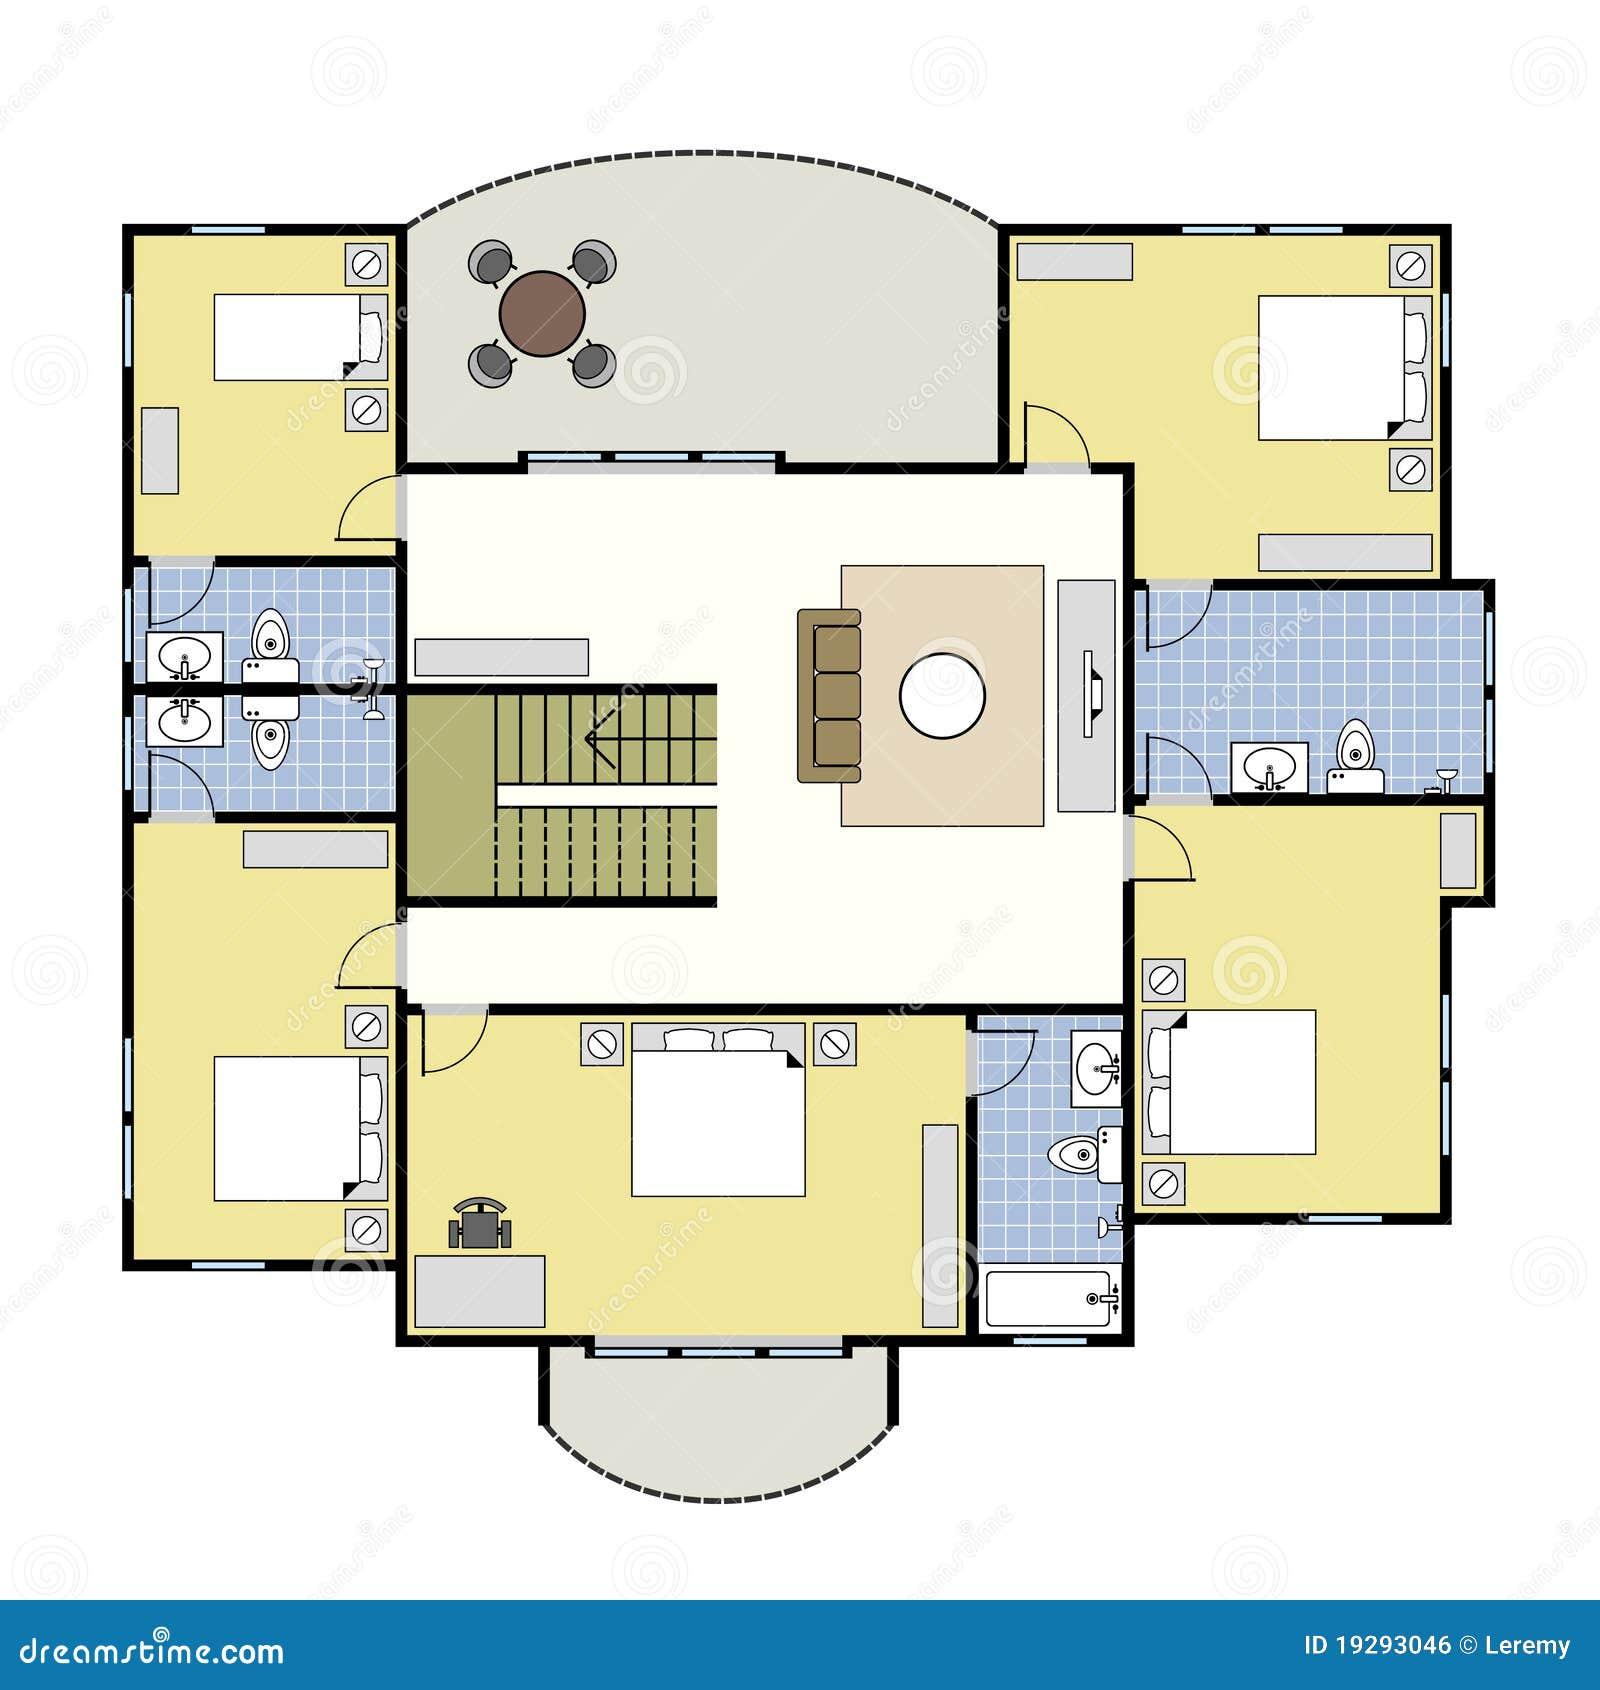 Floorplan Architecture Plan House Stock Vector